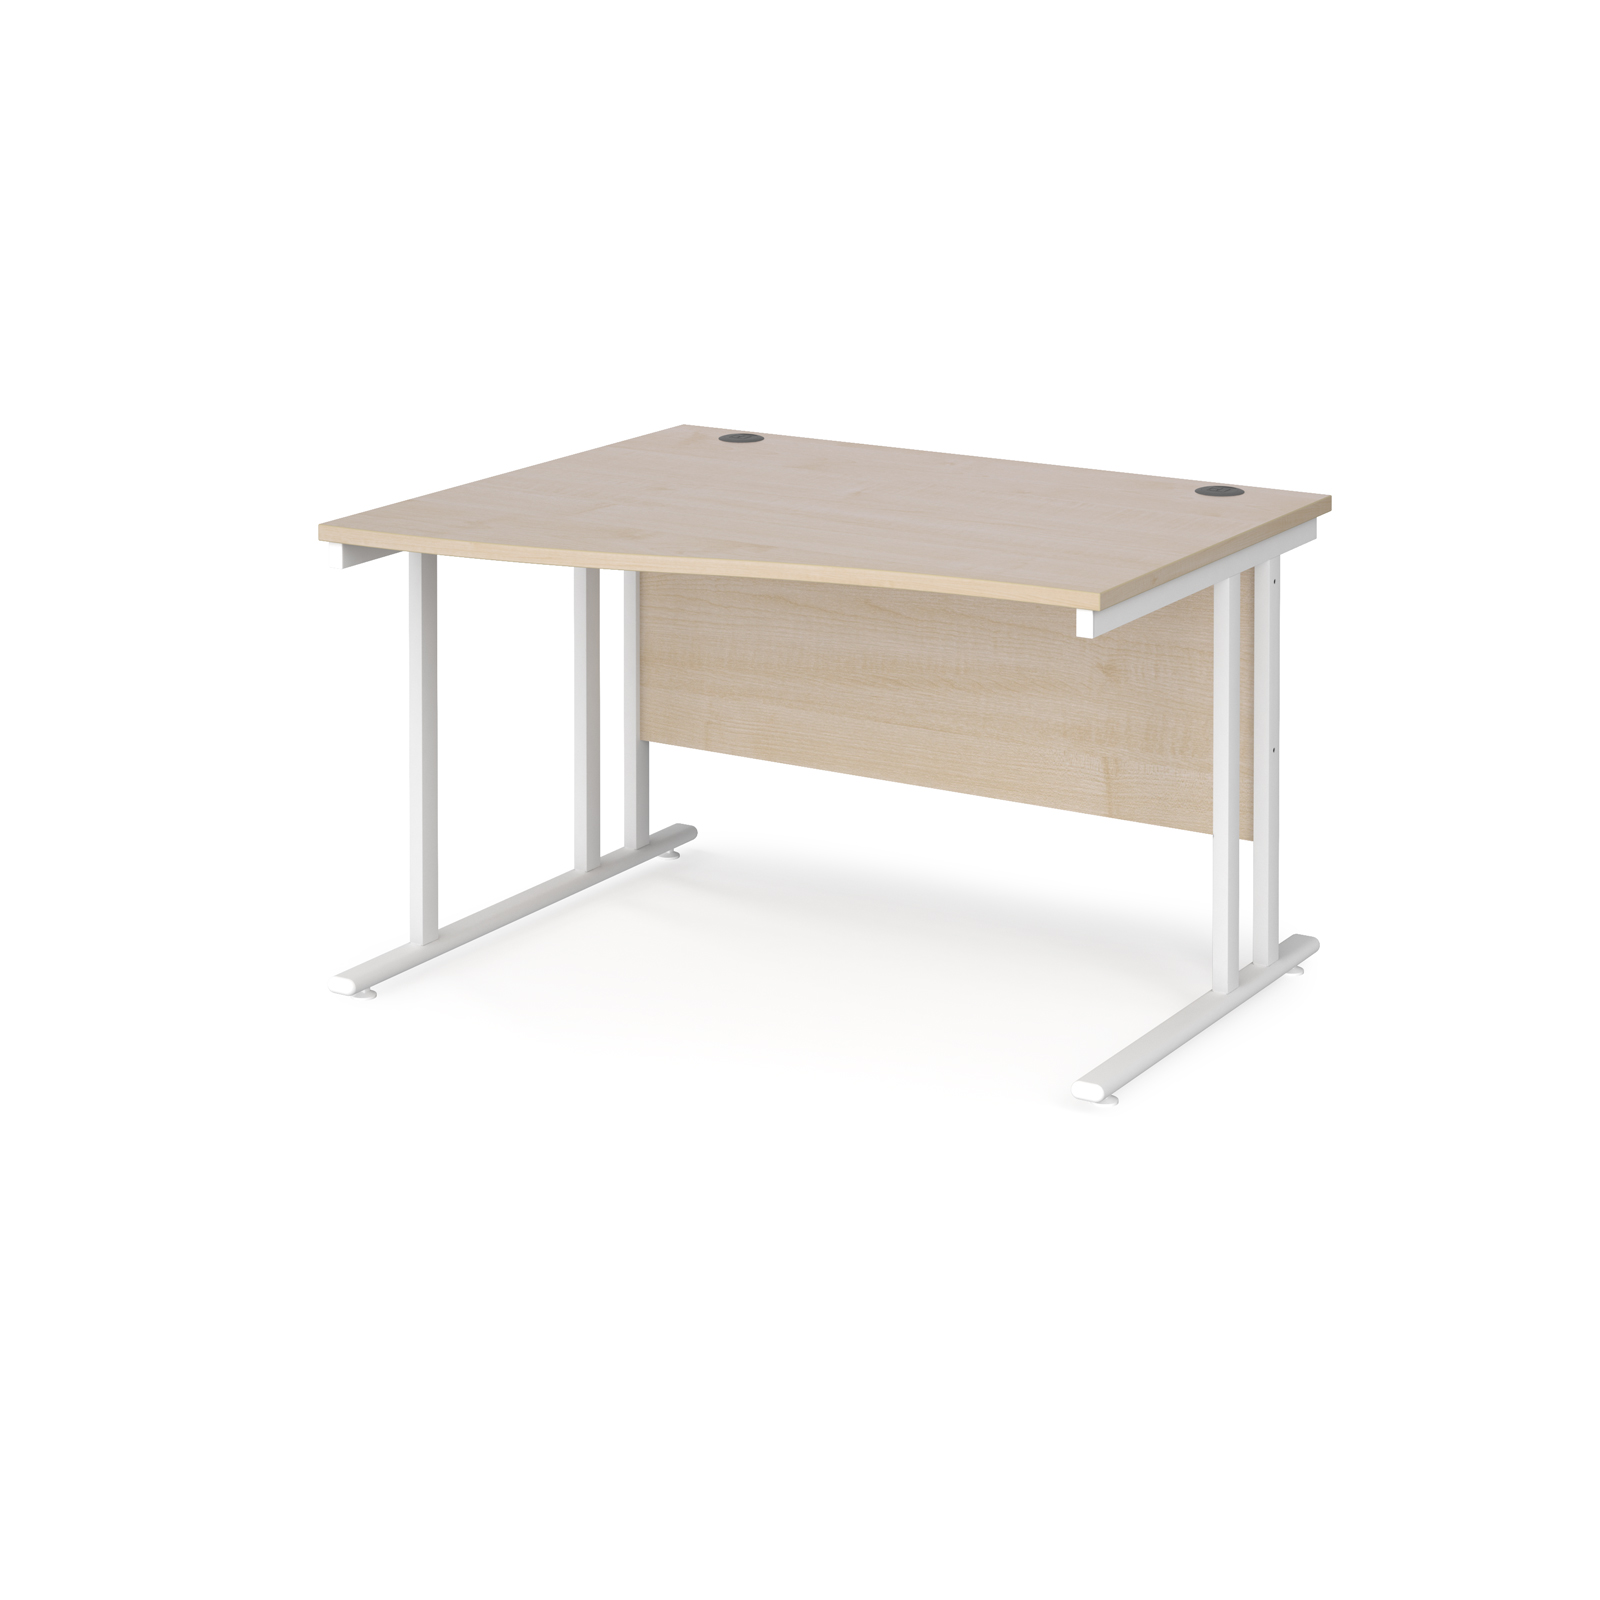 Left Handed Maestro 25 left hand wave desk 1200mm wide - white cantilever leg frame, maple top